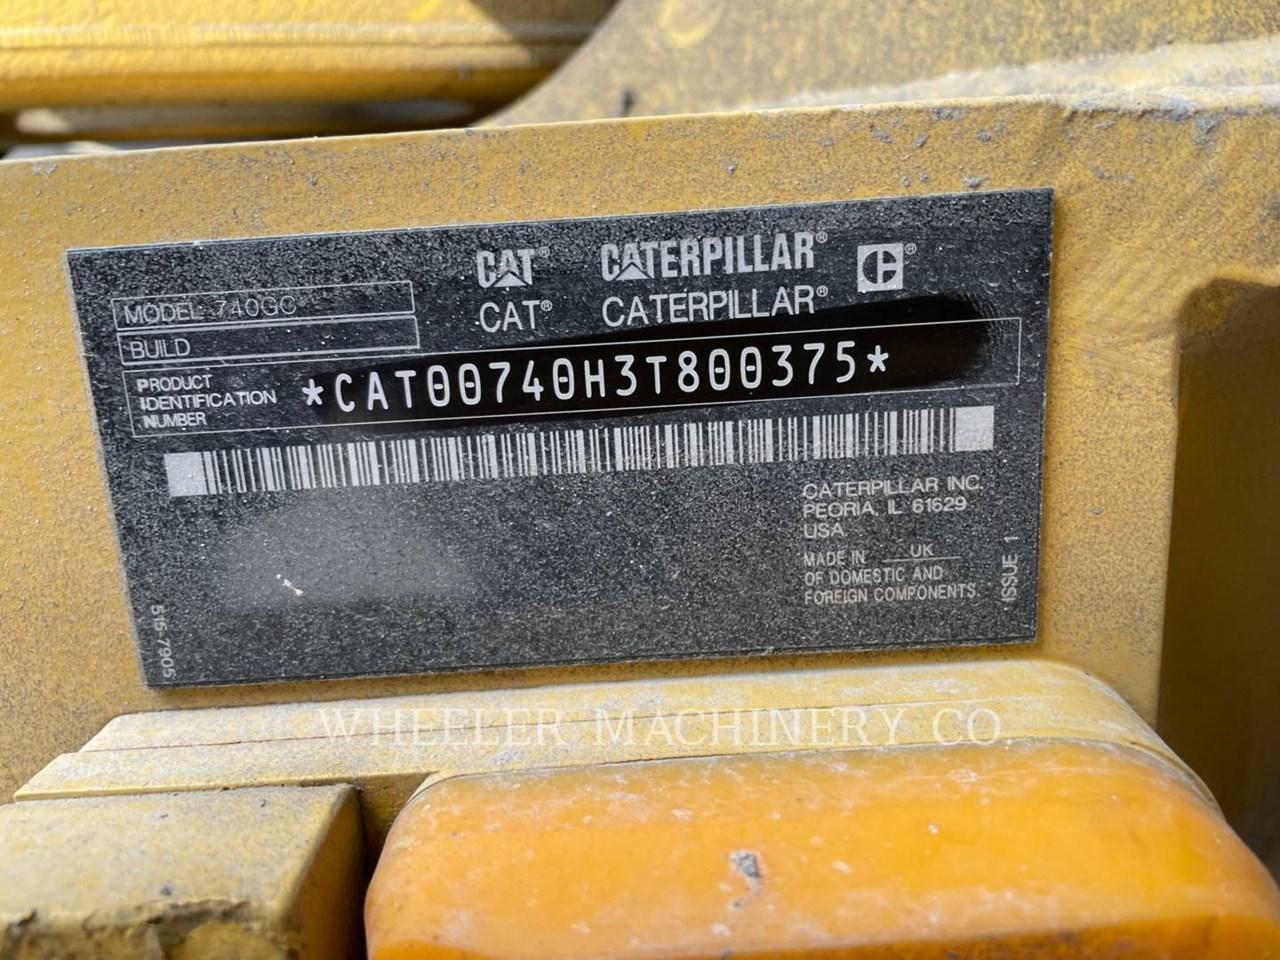 2020 Caterpillar WT 740 GC Image 5